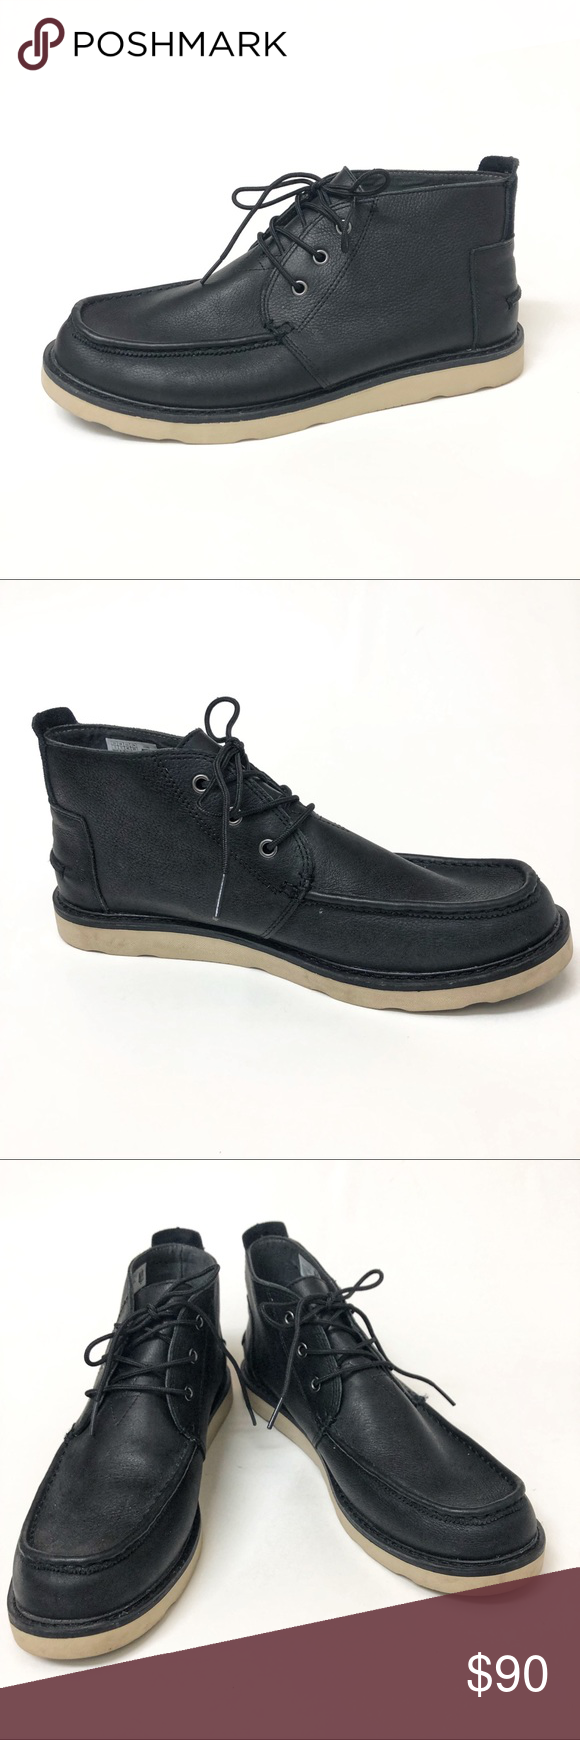 Toms Black Leather Chukka Boots Leather chukka boots